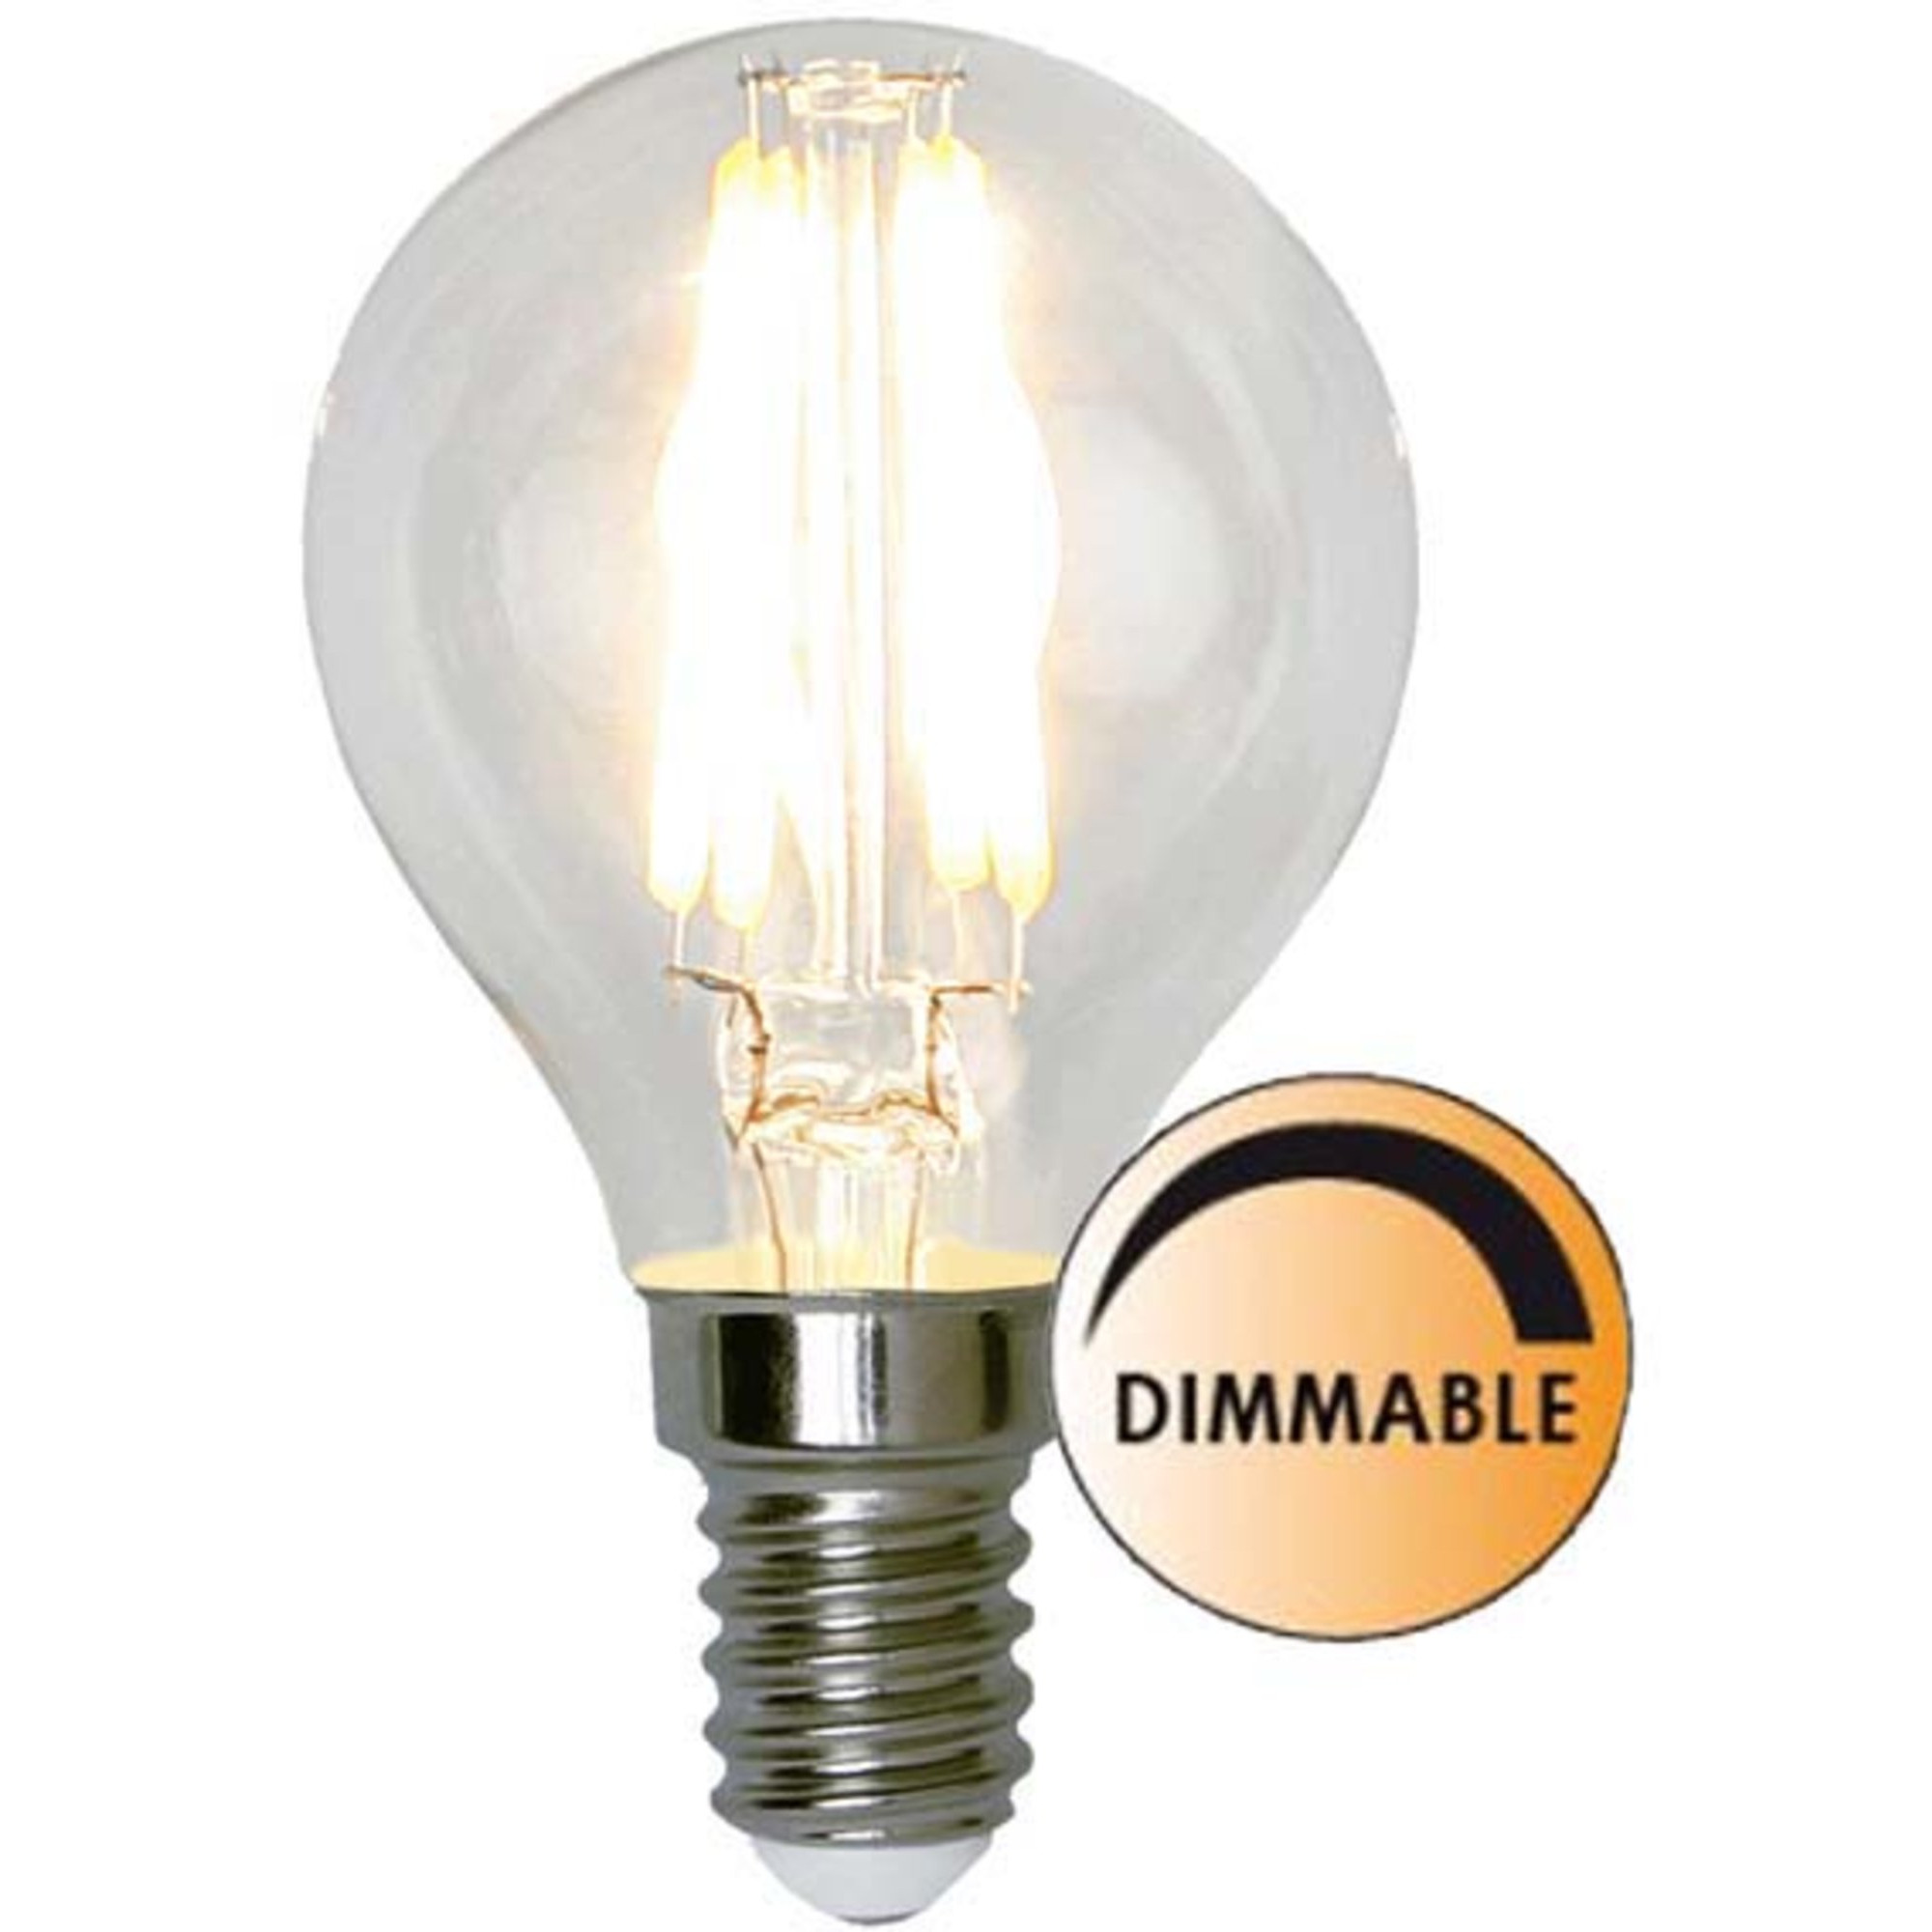 Globen Lighting Ljuskälla LED 351-23 Filament Klot Klar 5W Dimbar E14